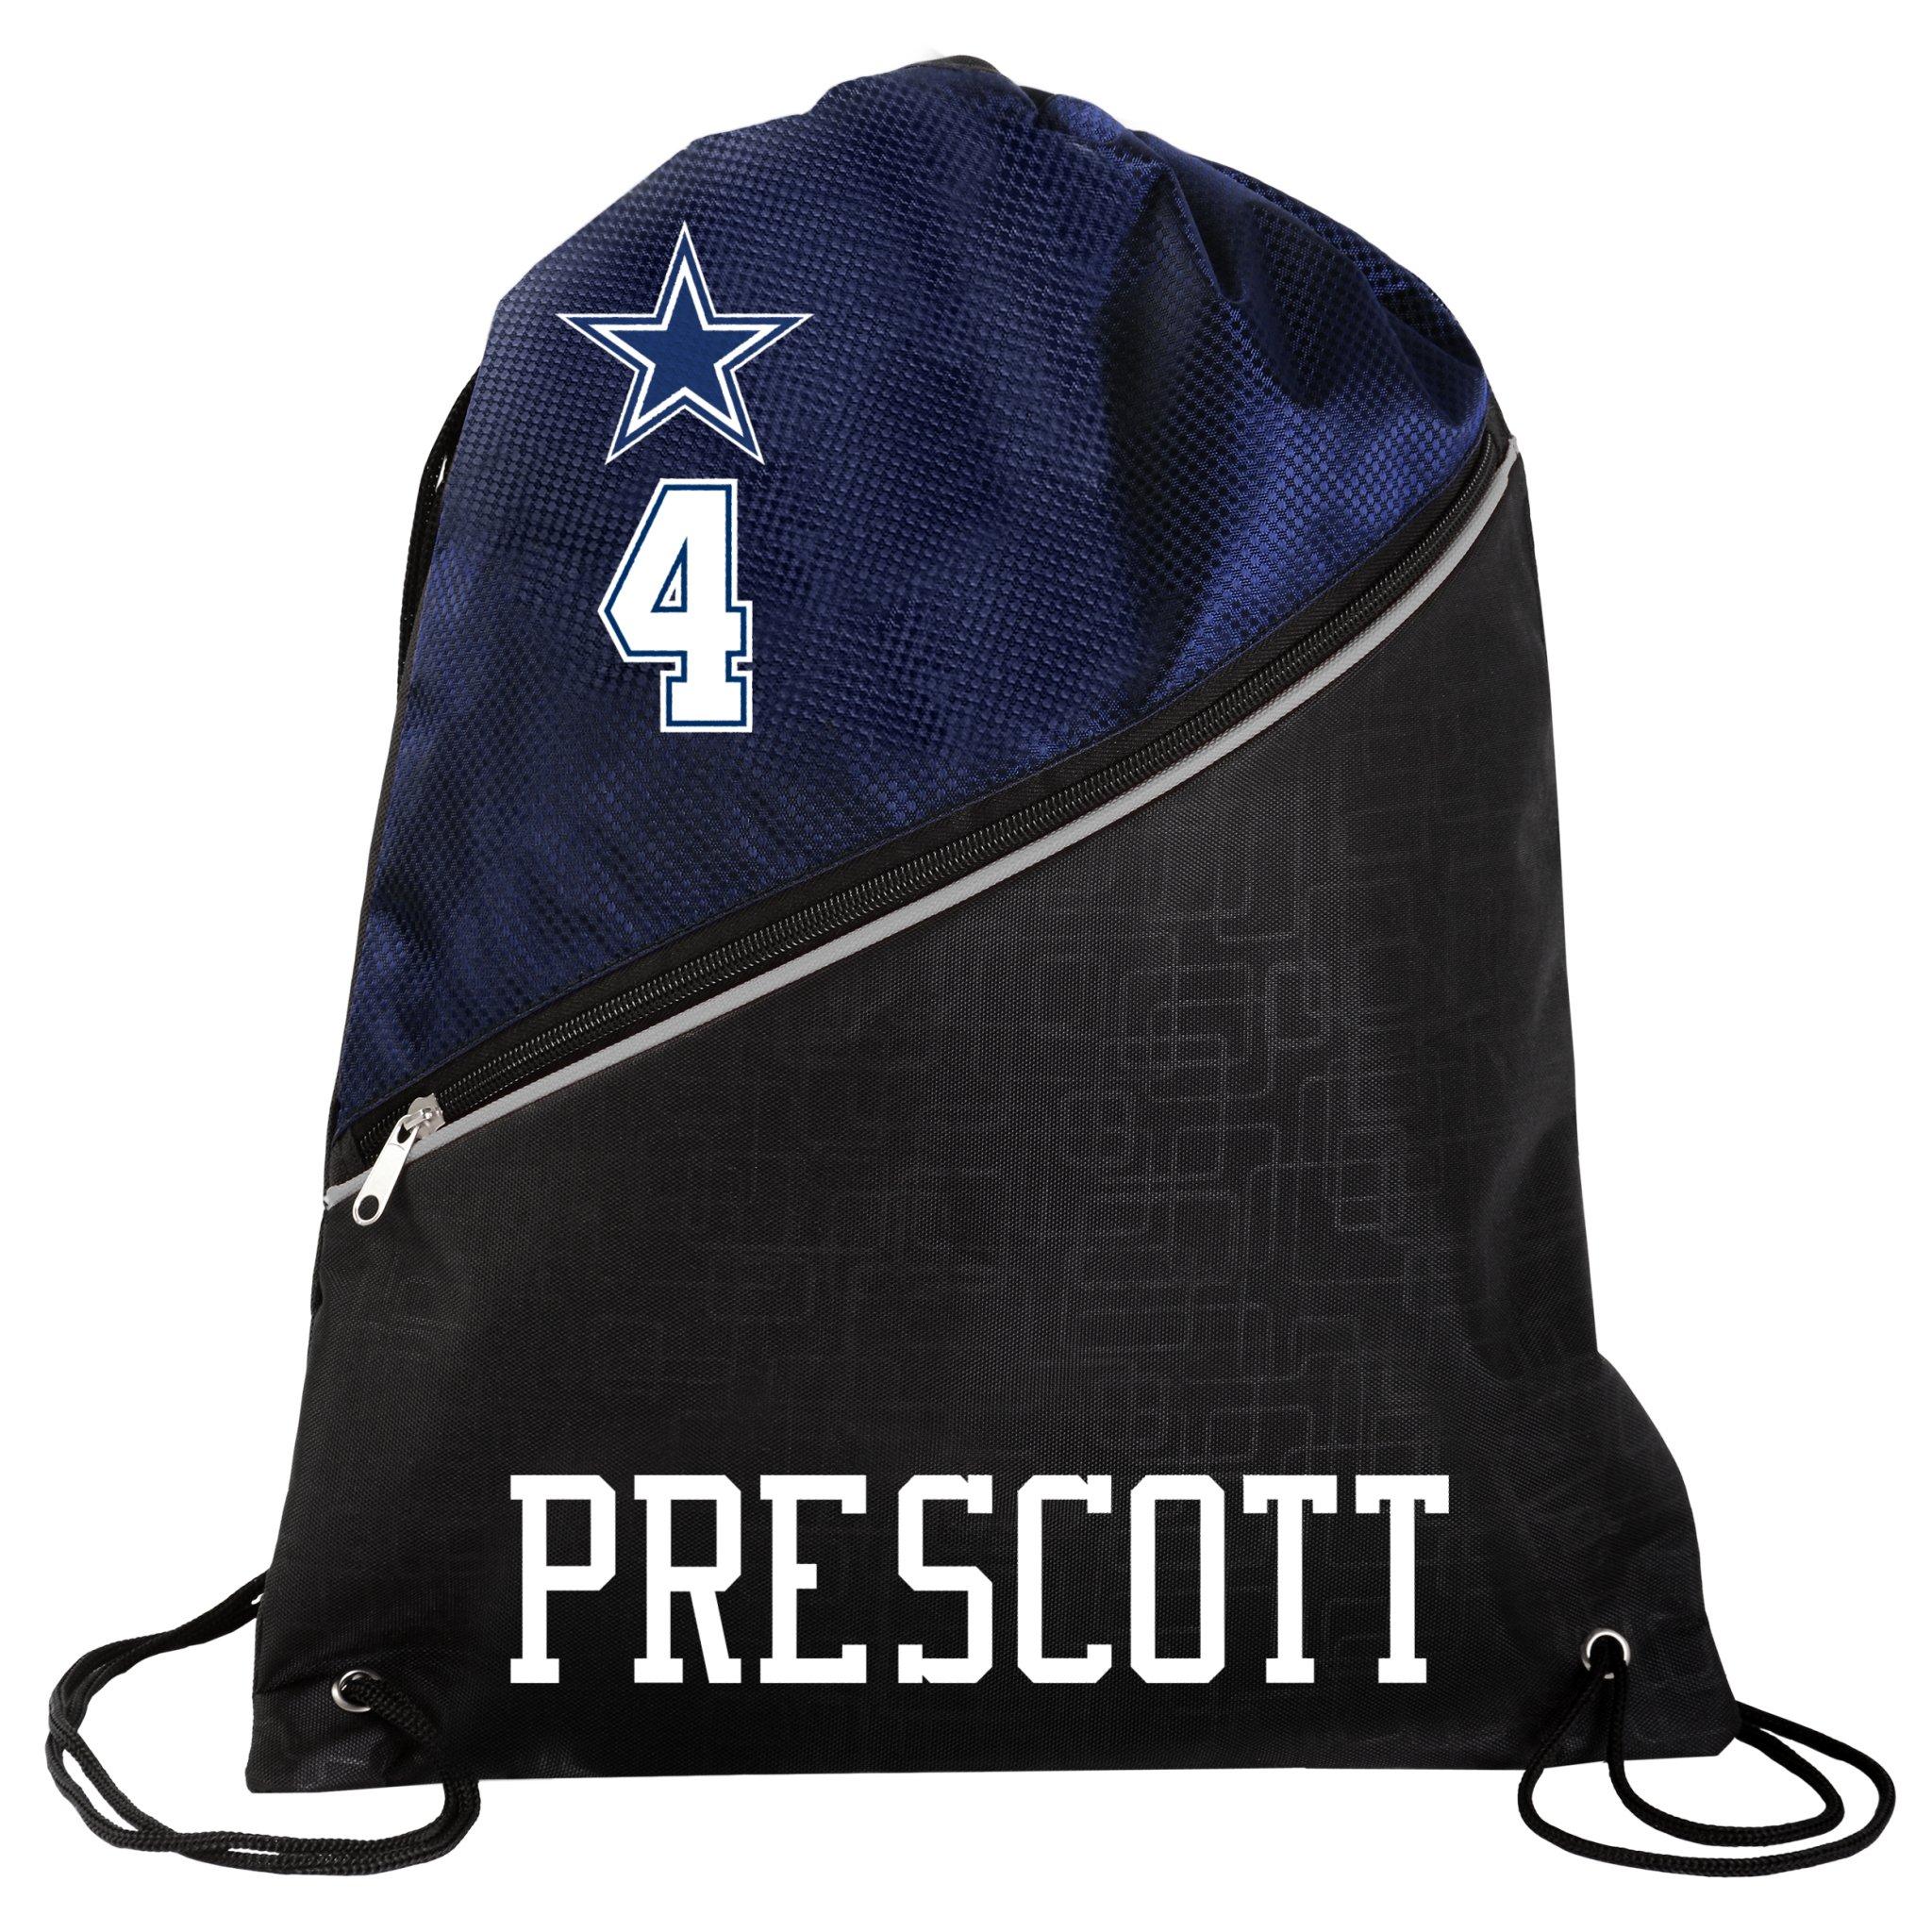 FOCO Dallas Cowboys Official High End Diagonal Zipper Drawstring Backpack Gym Bag - Dak Prescott #4